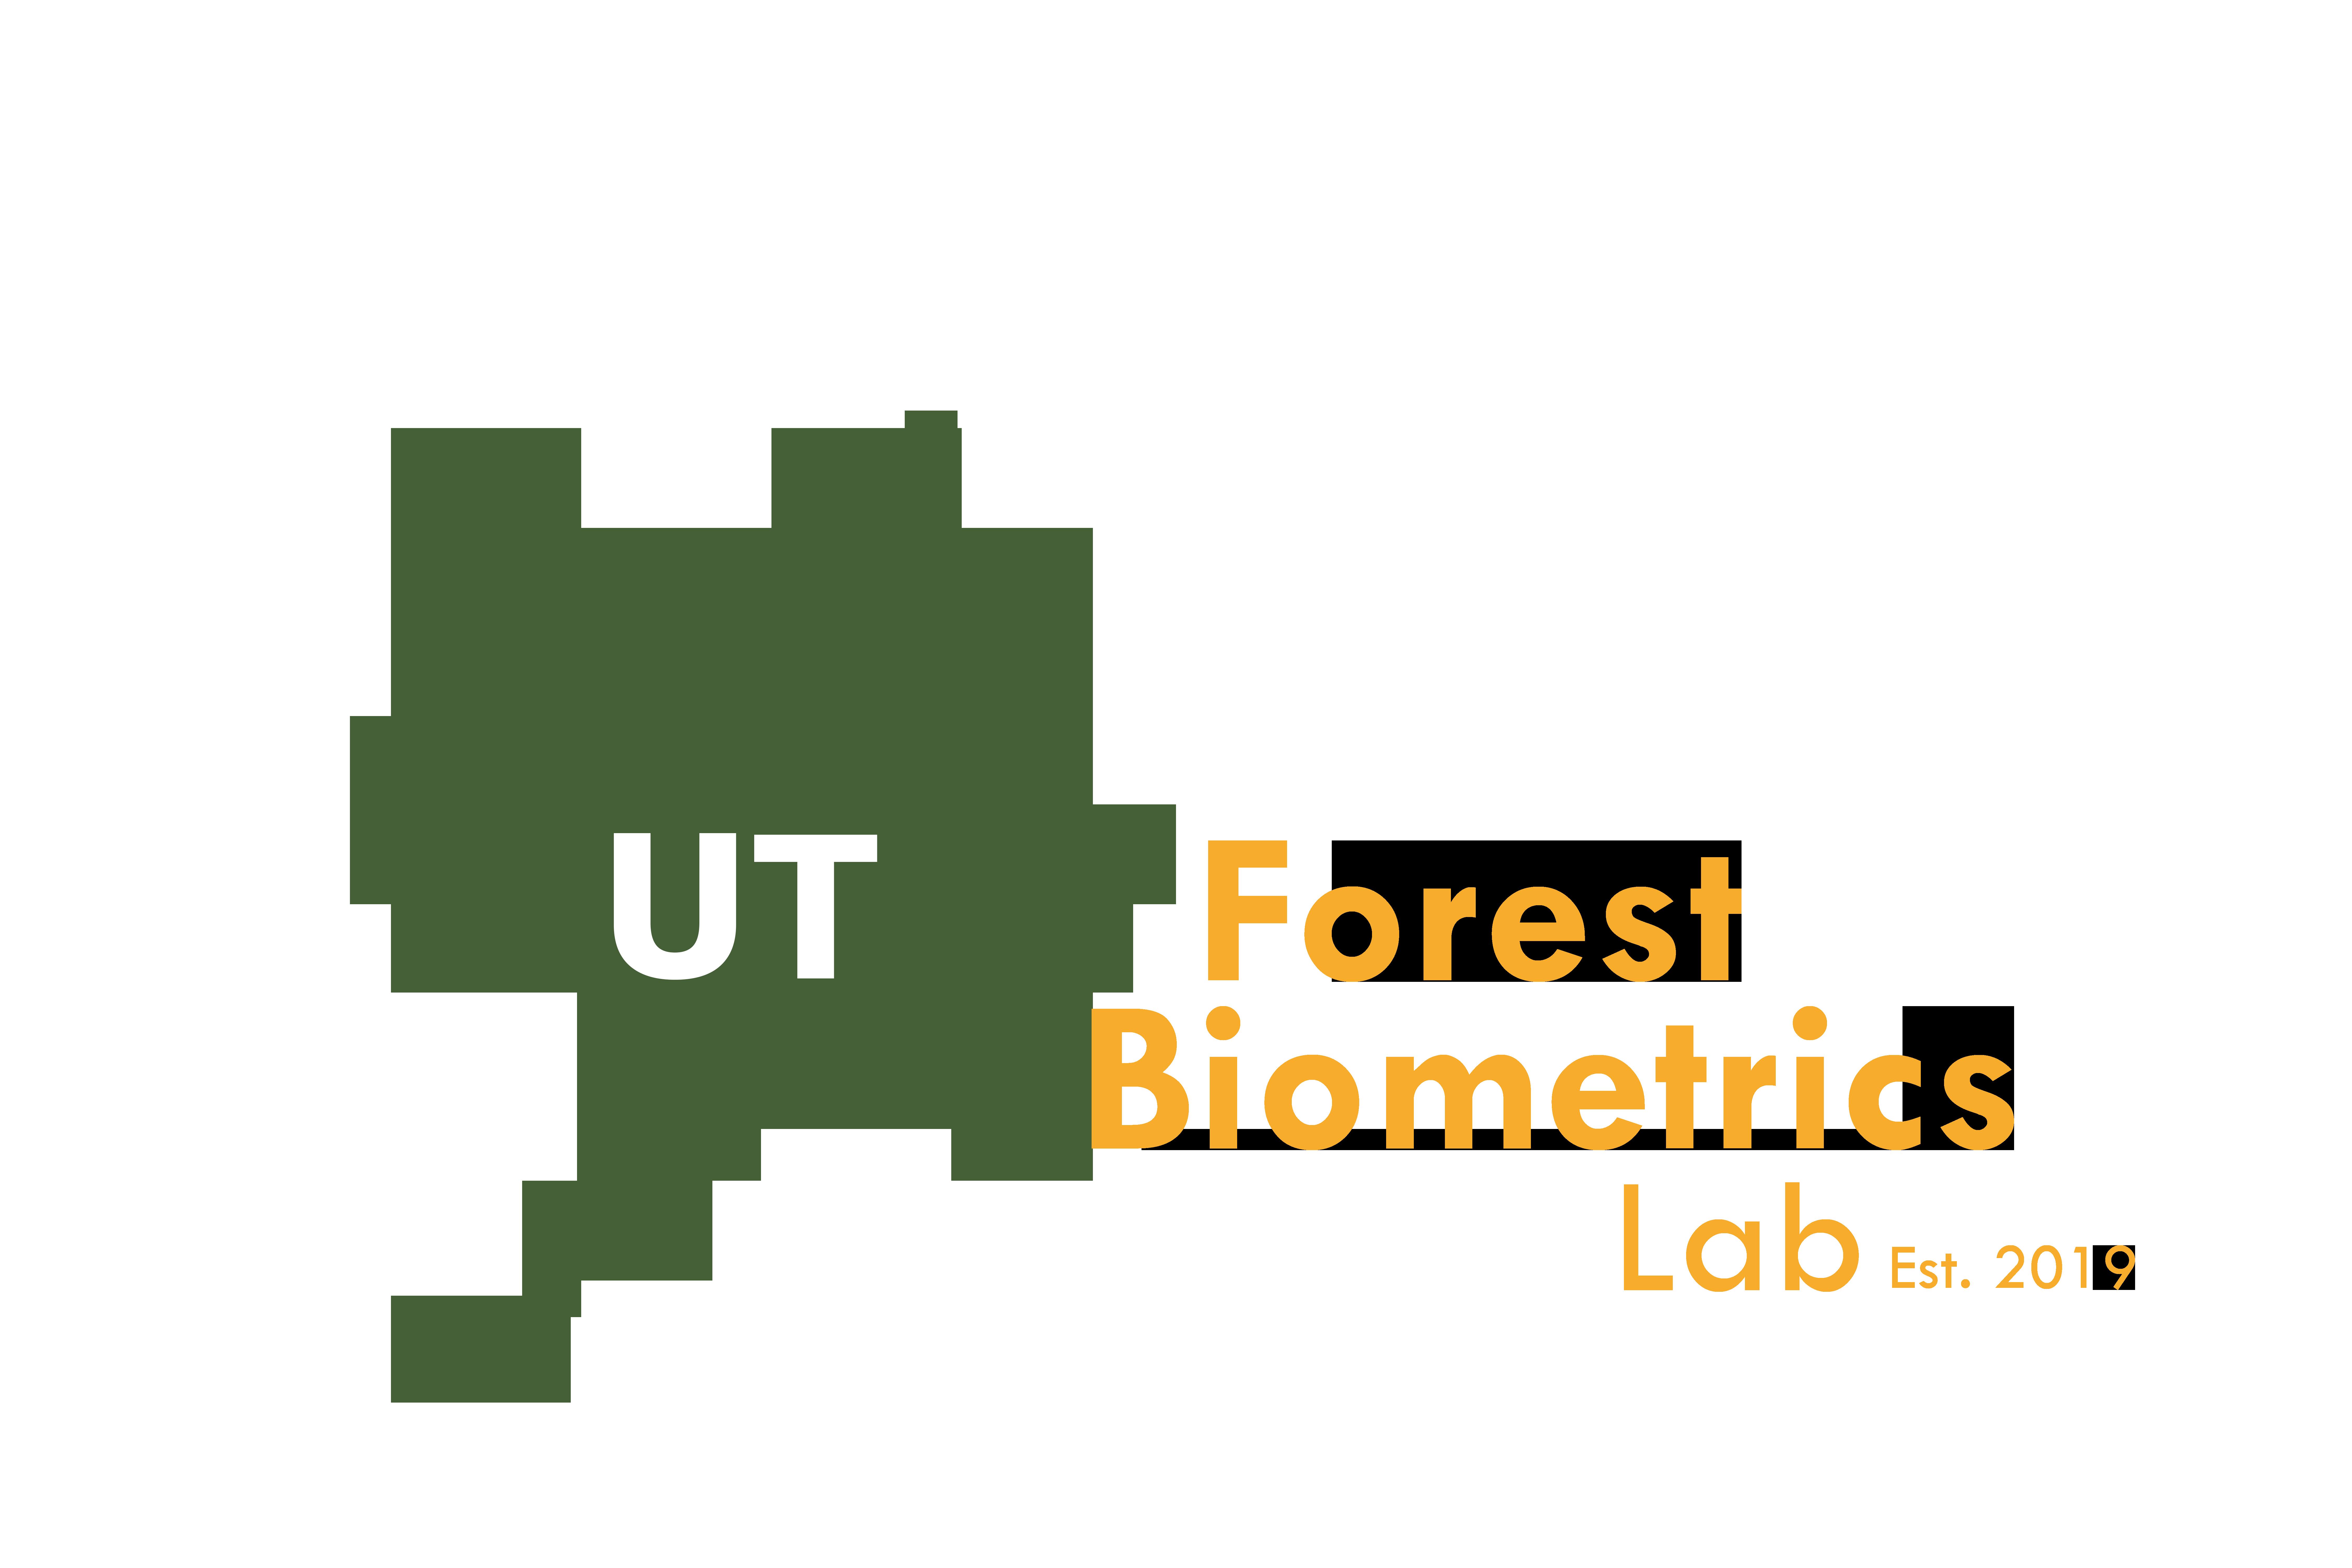 UT Forest Biometrics Lab logo